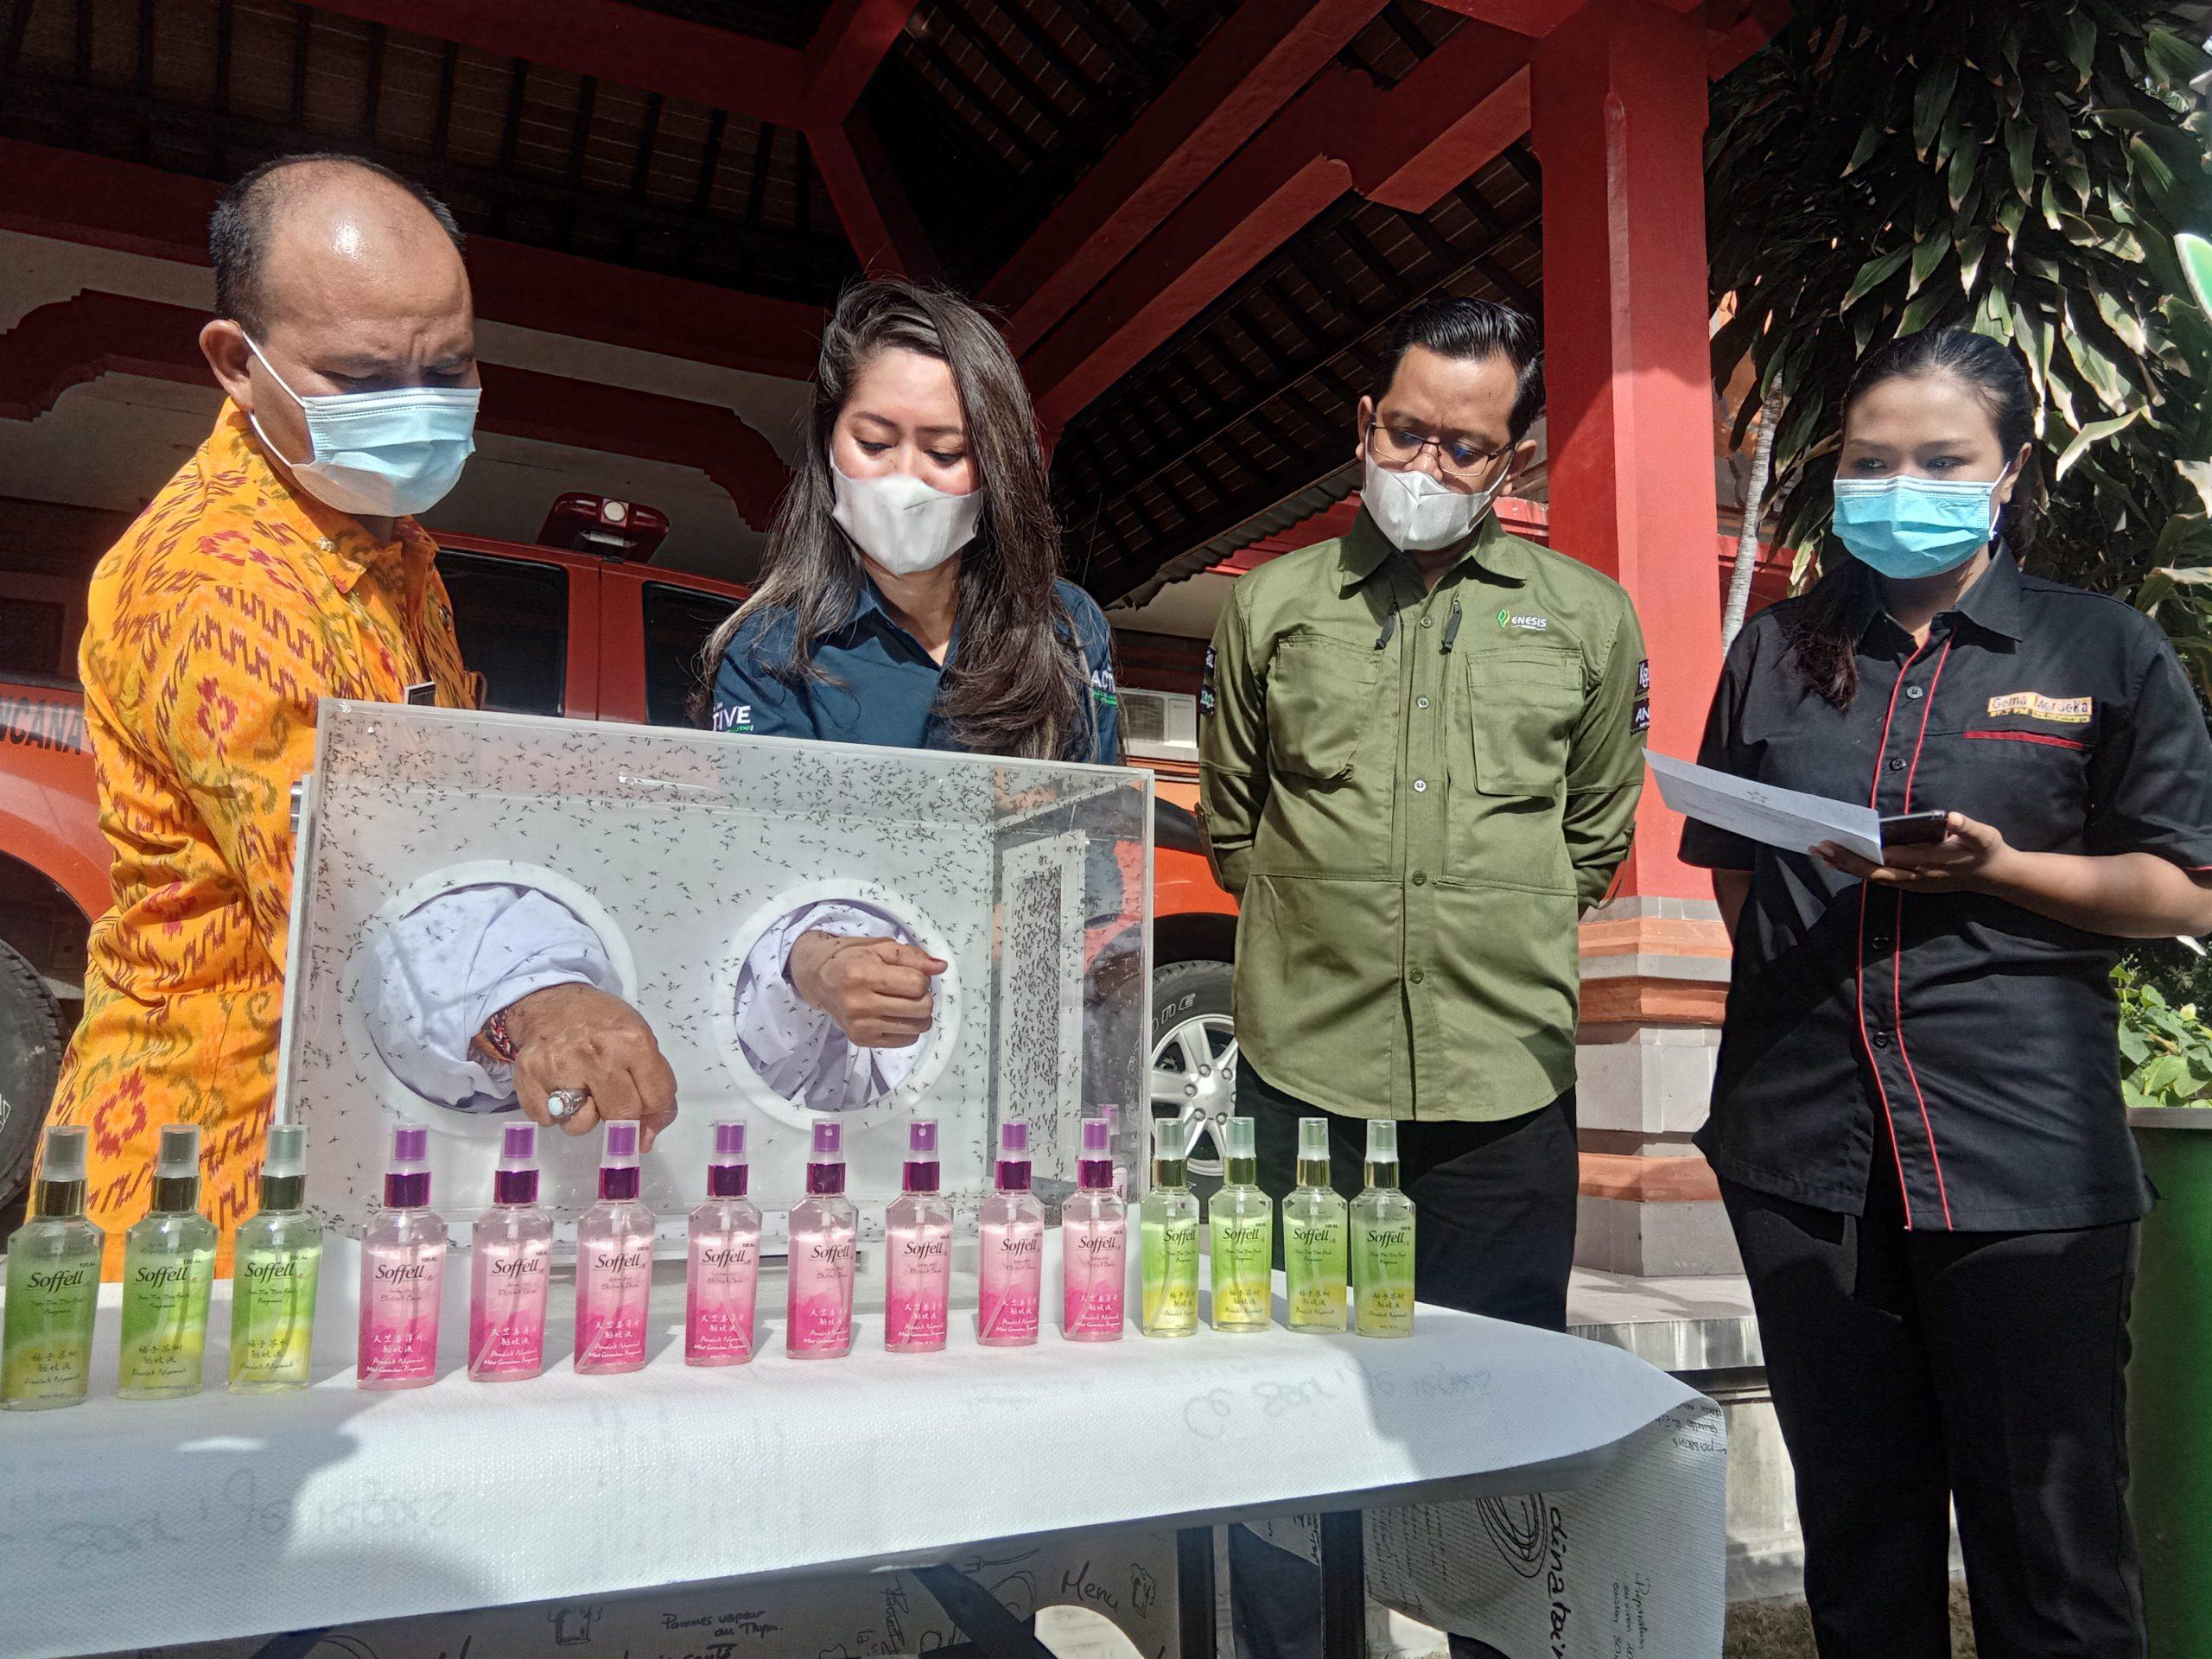 KALAKSA BPBD Bali, Made Rentin; didampingi Ketua Yayasan Enesis Indonesia, Elkana Lewerissa, saat mempraktekkan keampuhan Soffell spray ke backet nyamuk. Foto: alt